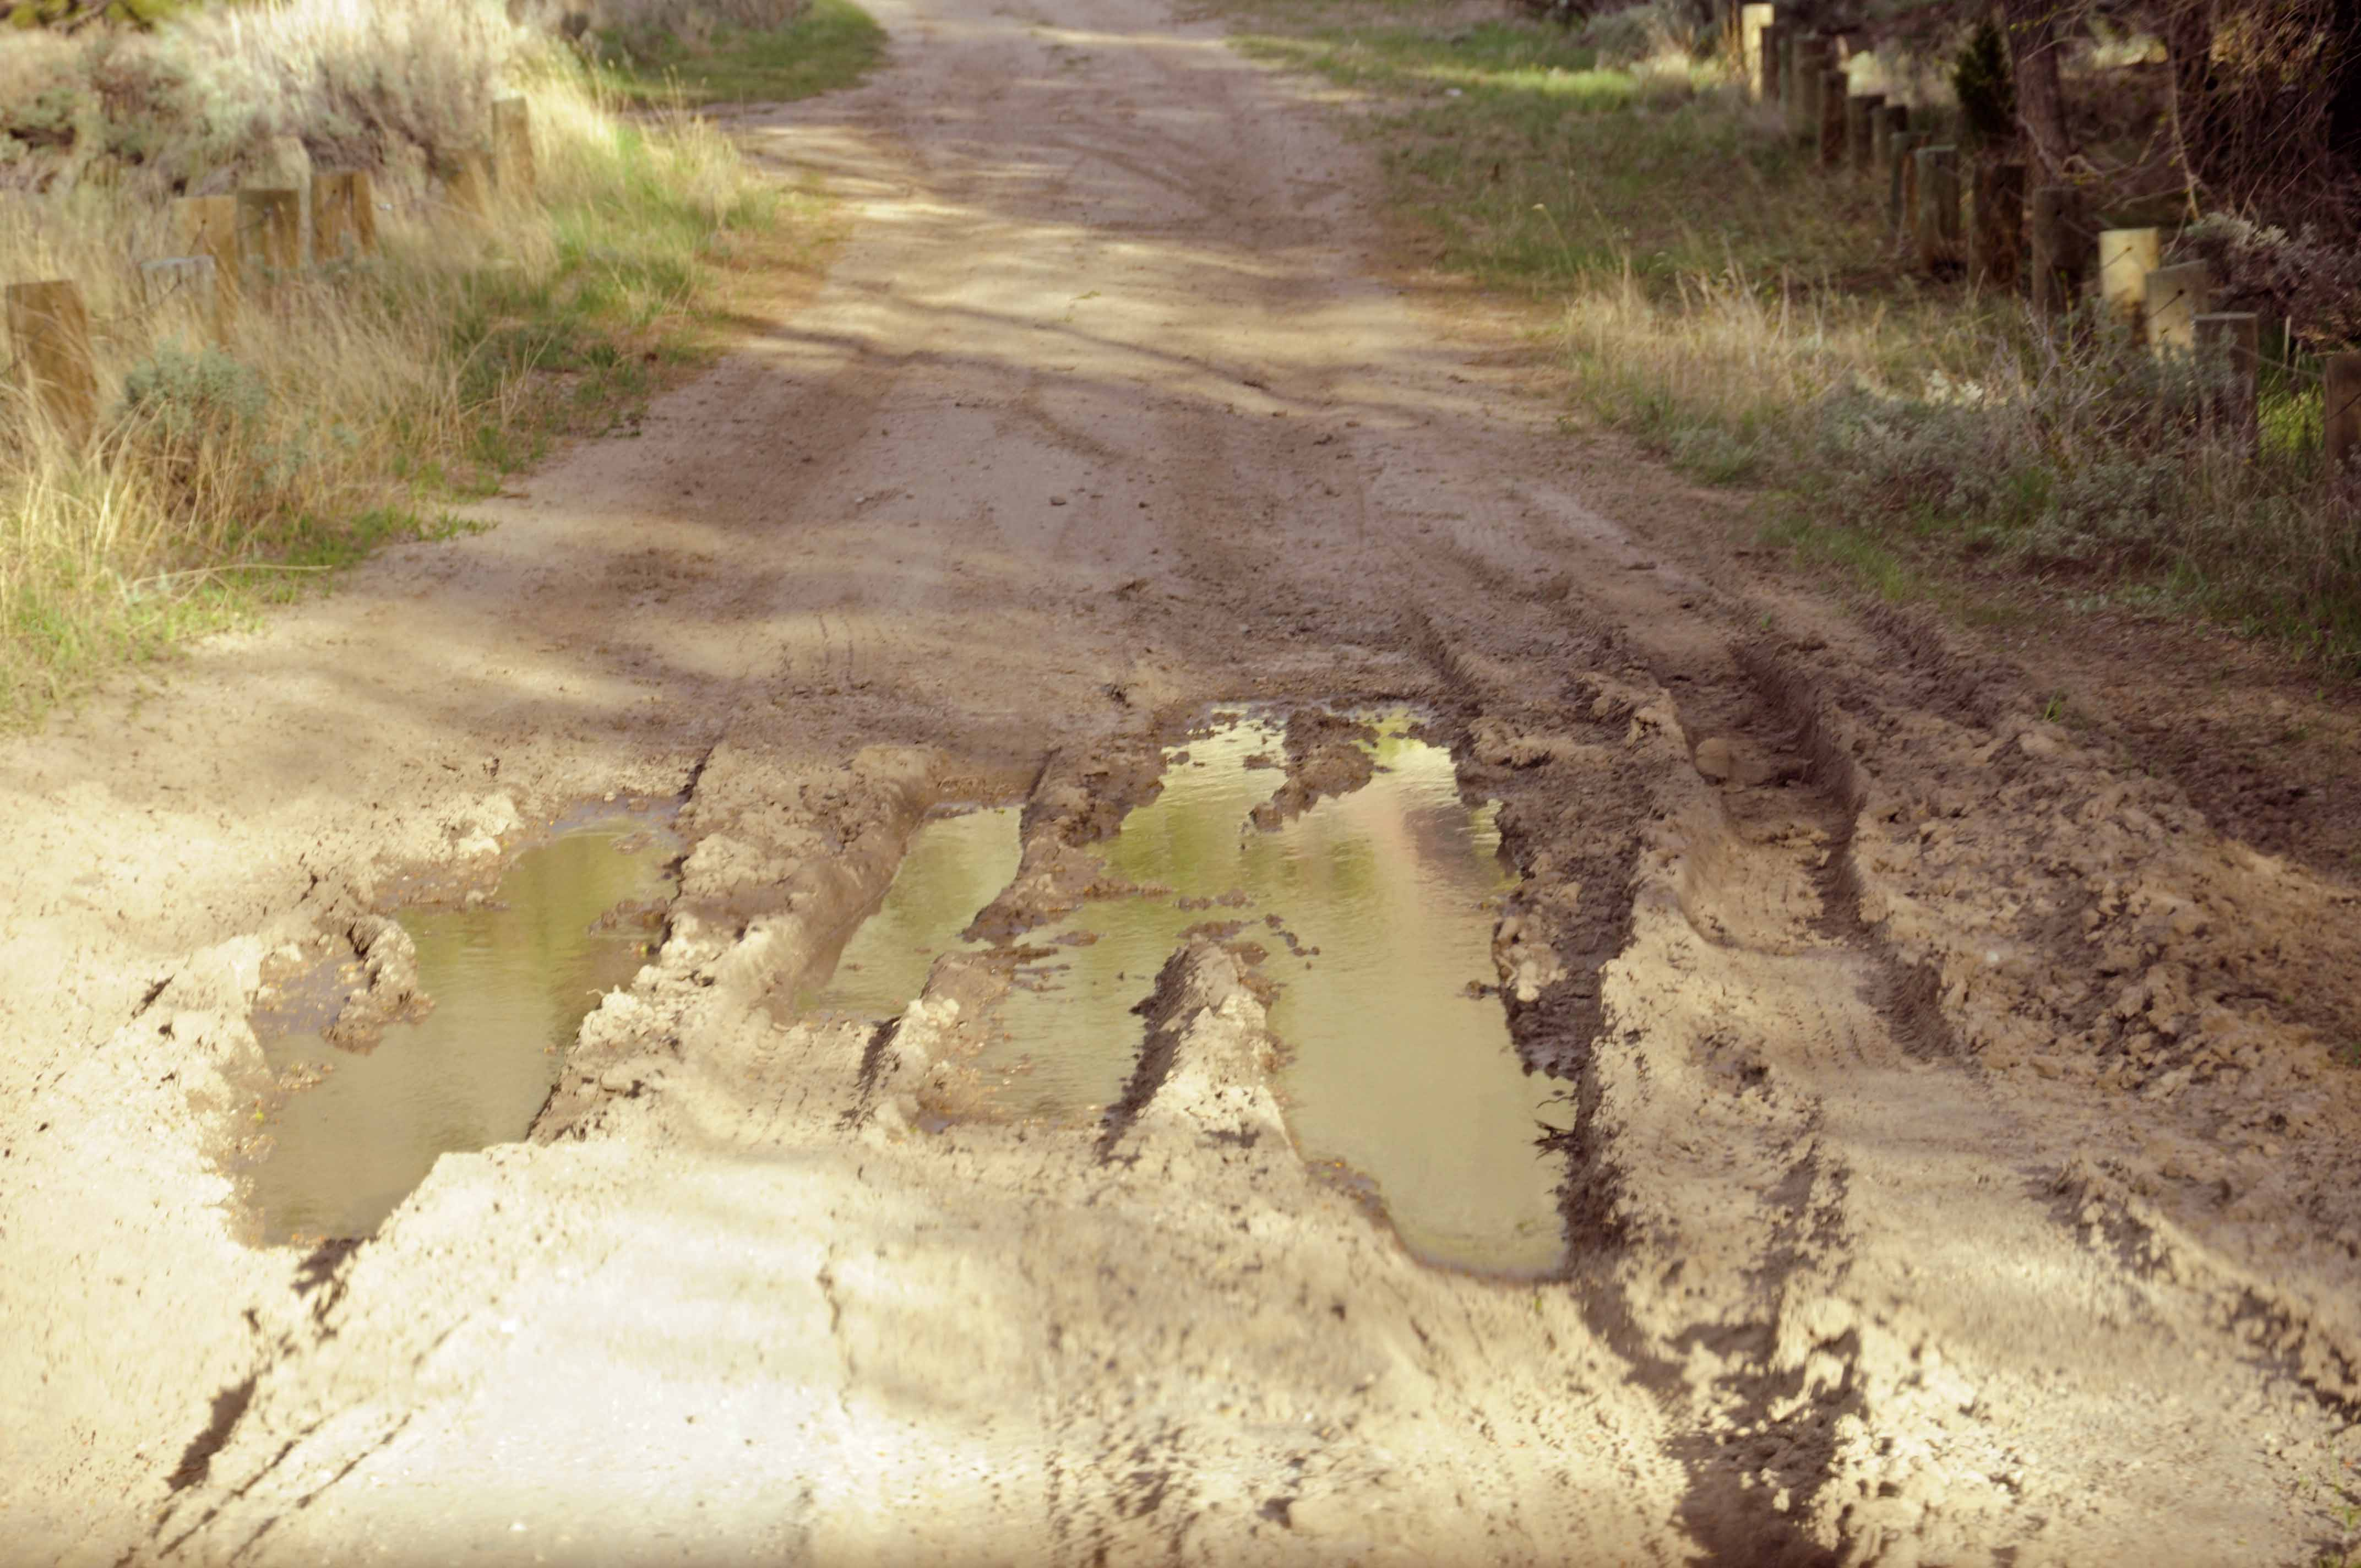 how to fix ruts in dirt road